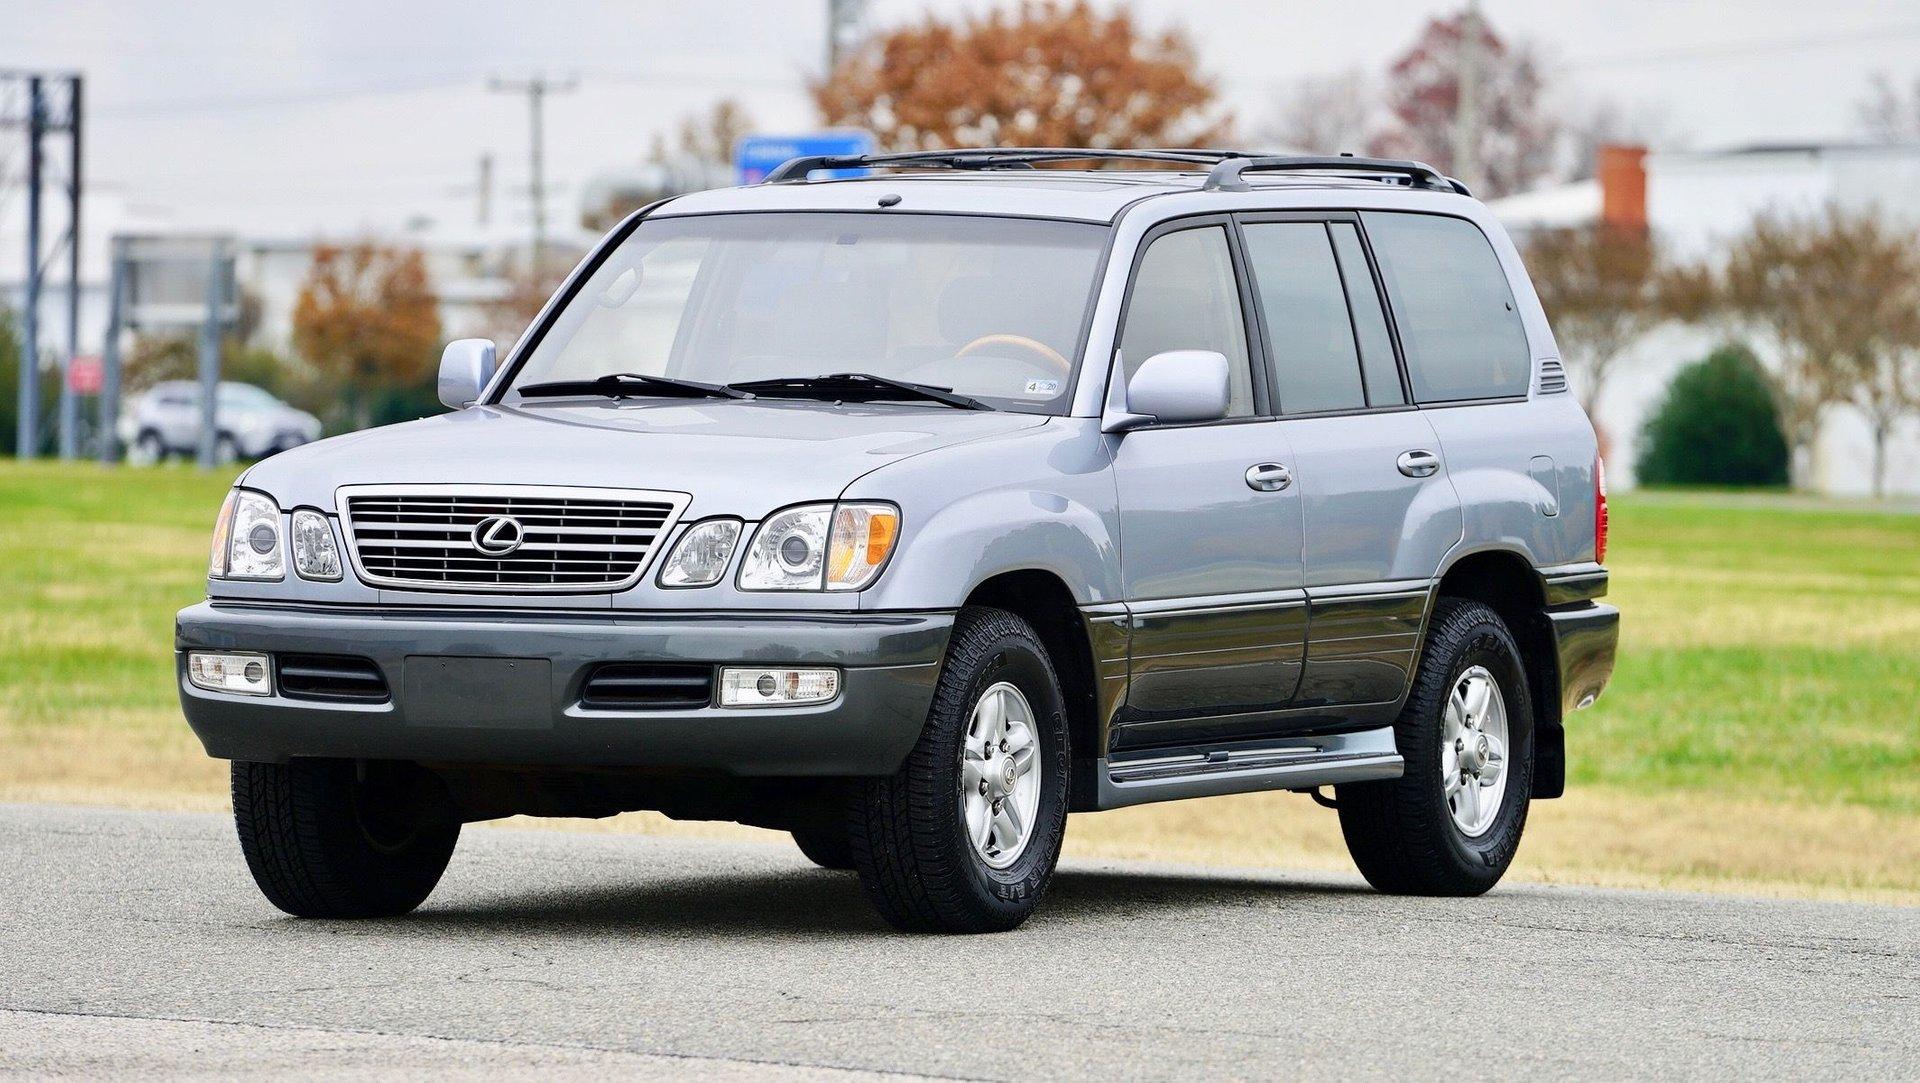 2002 lexus lx 470 4dr suv